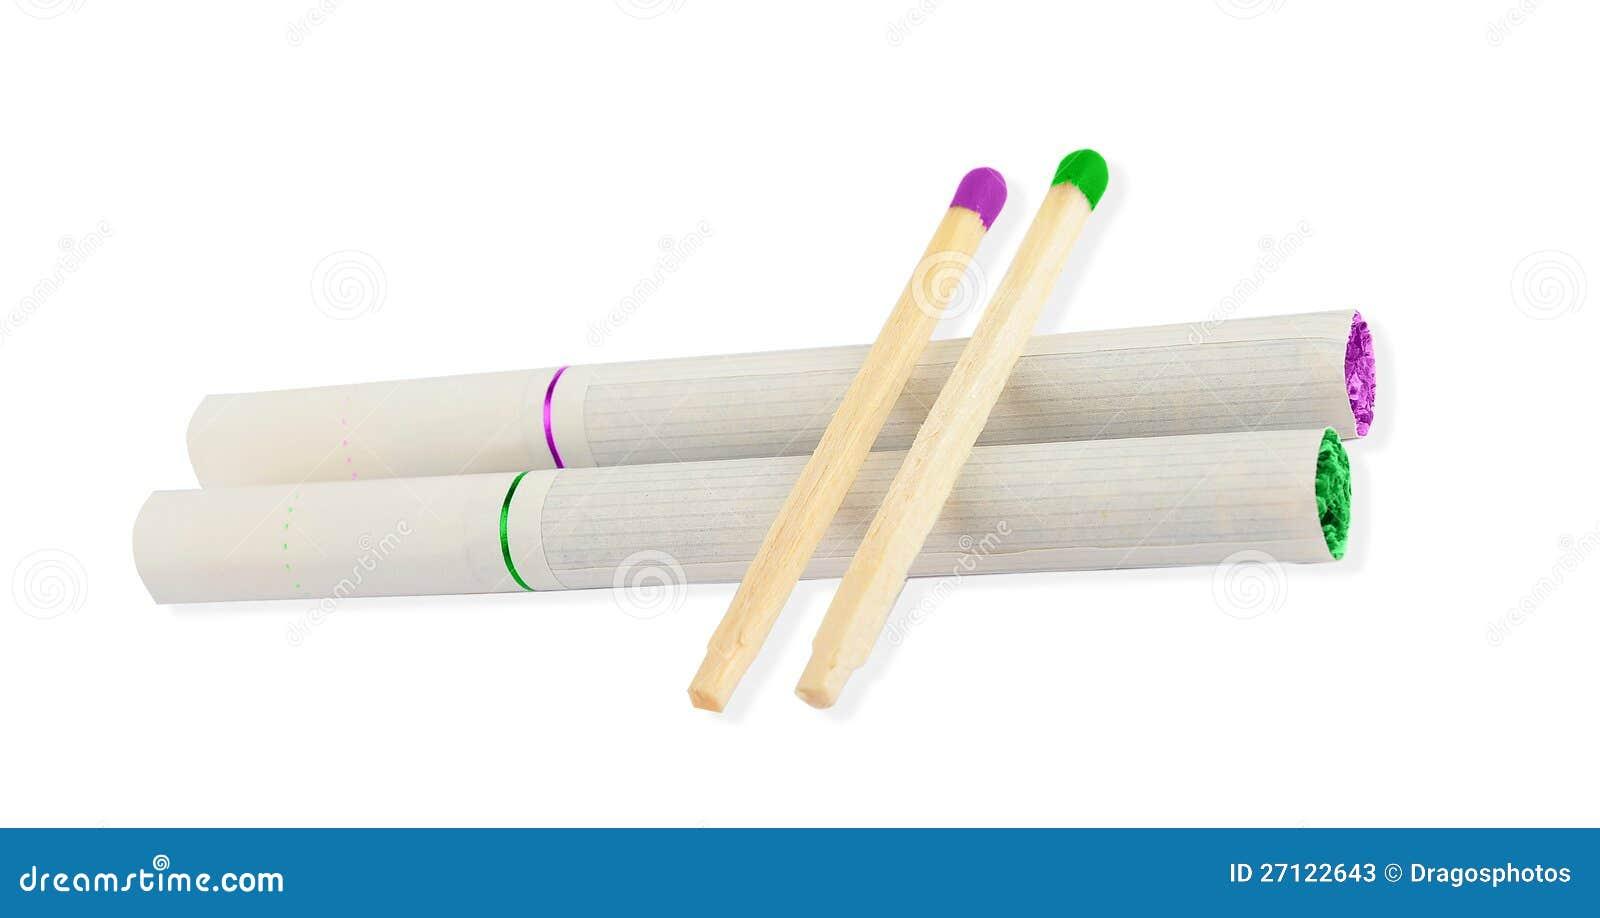 china water vapor cigarettes 500 puffs colored rainbow ...  Colored Smoke Cigarettes